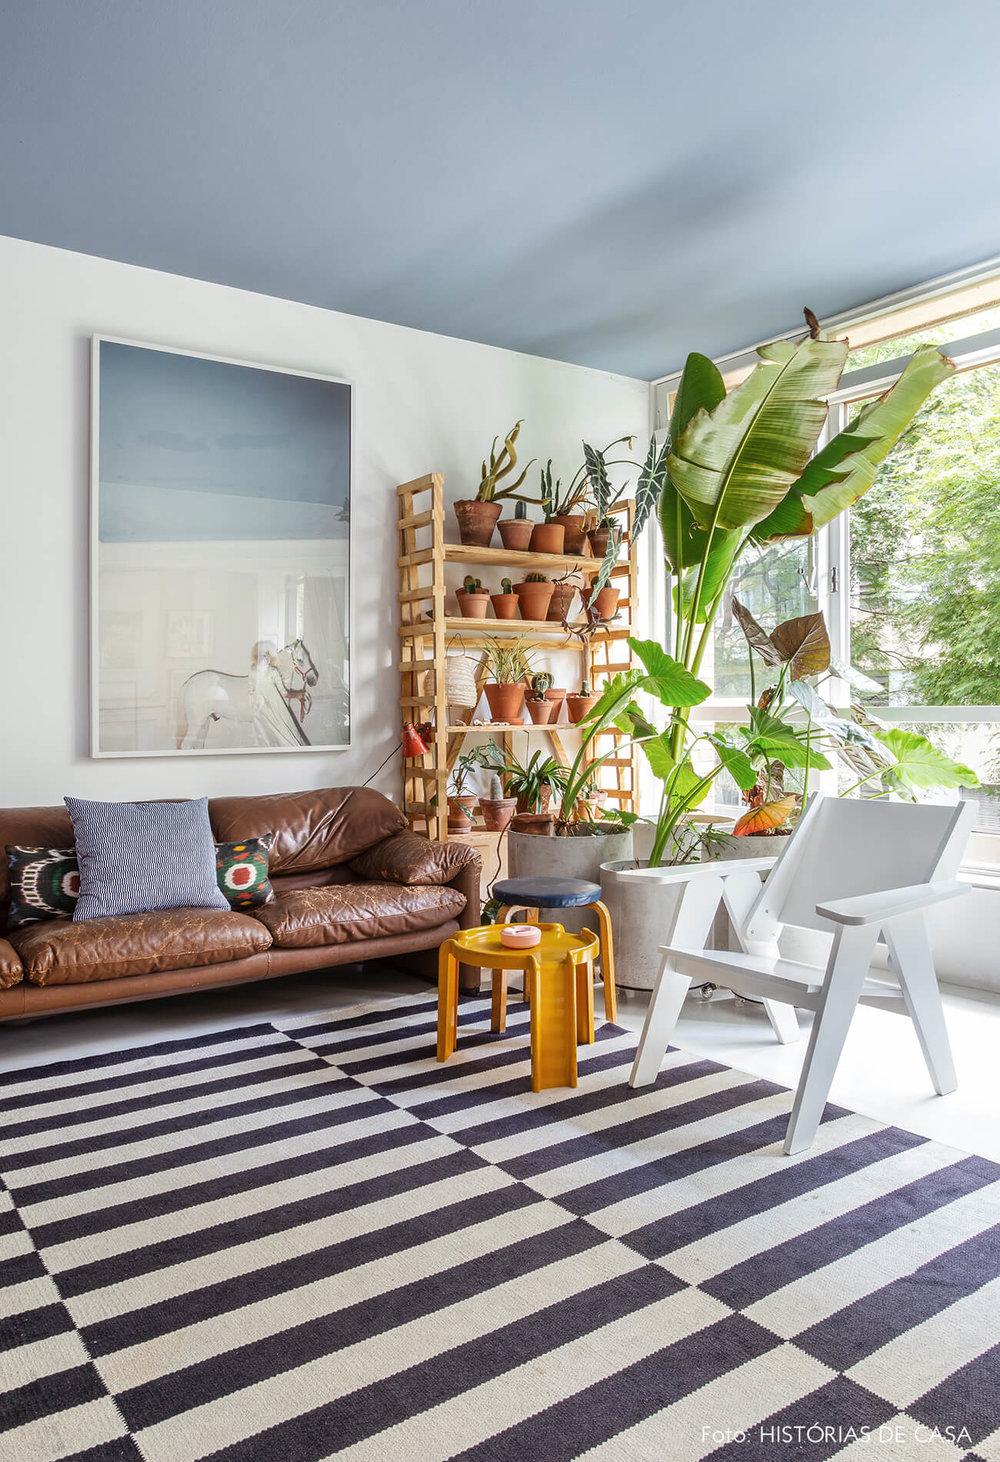 02-decoracao-o-apartamento-do-mauricio-arruda-historias-de-casa-estante-de-plantas.jpg